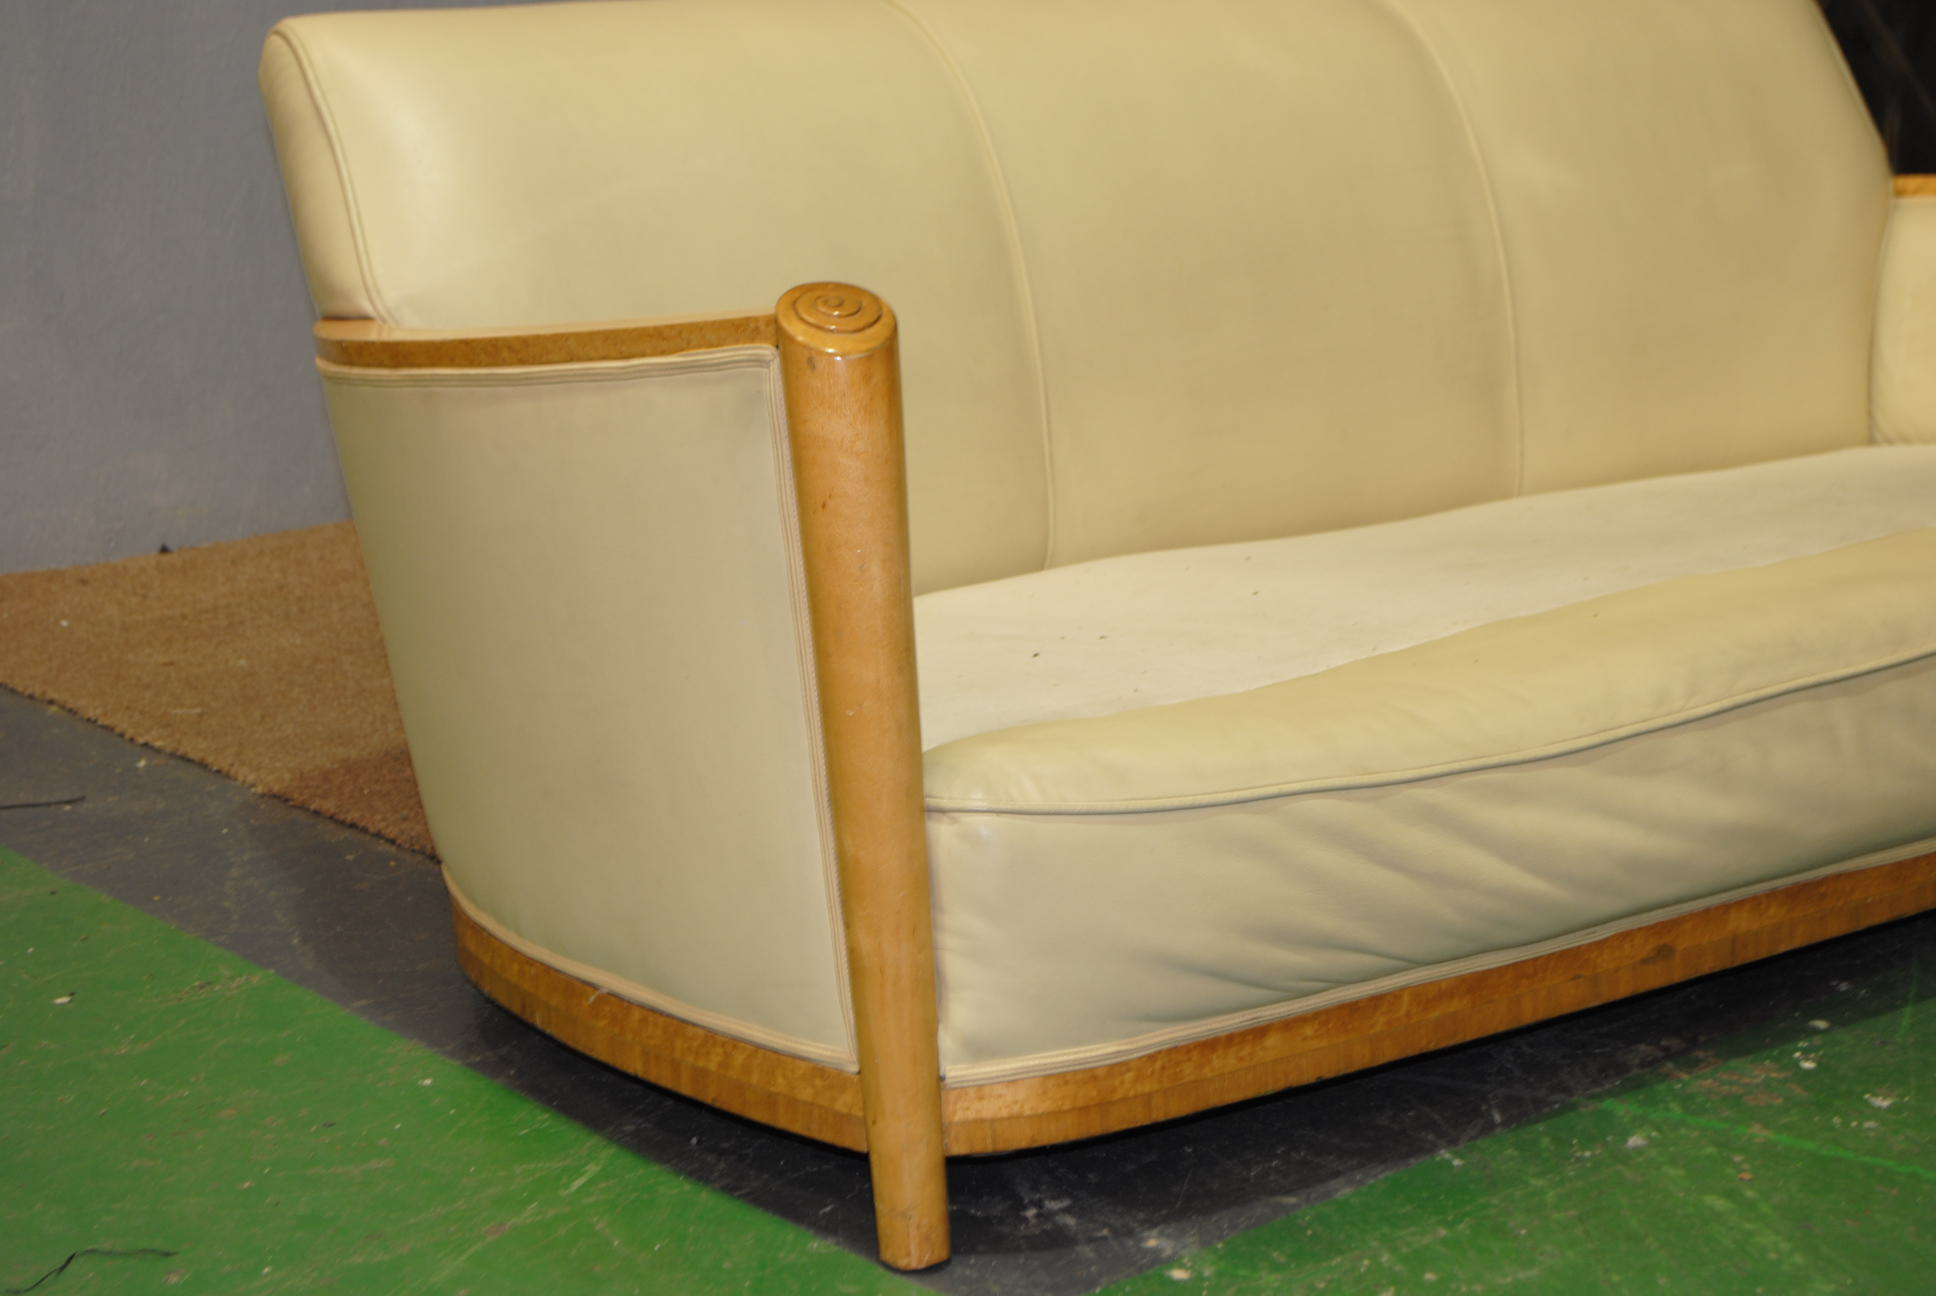 cloud 9 sofa set online olx bangalore art deco maurice adams furniture